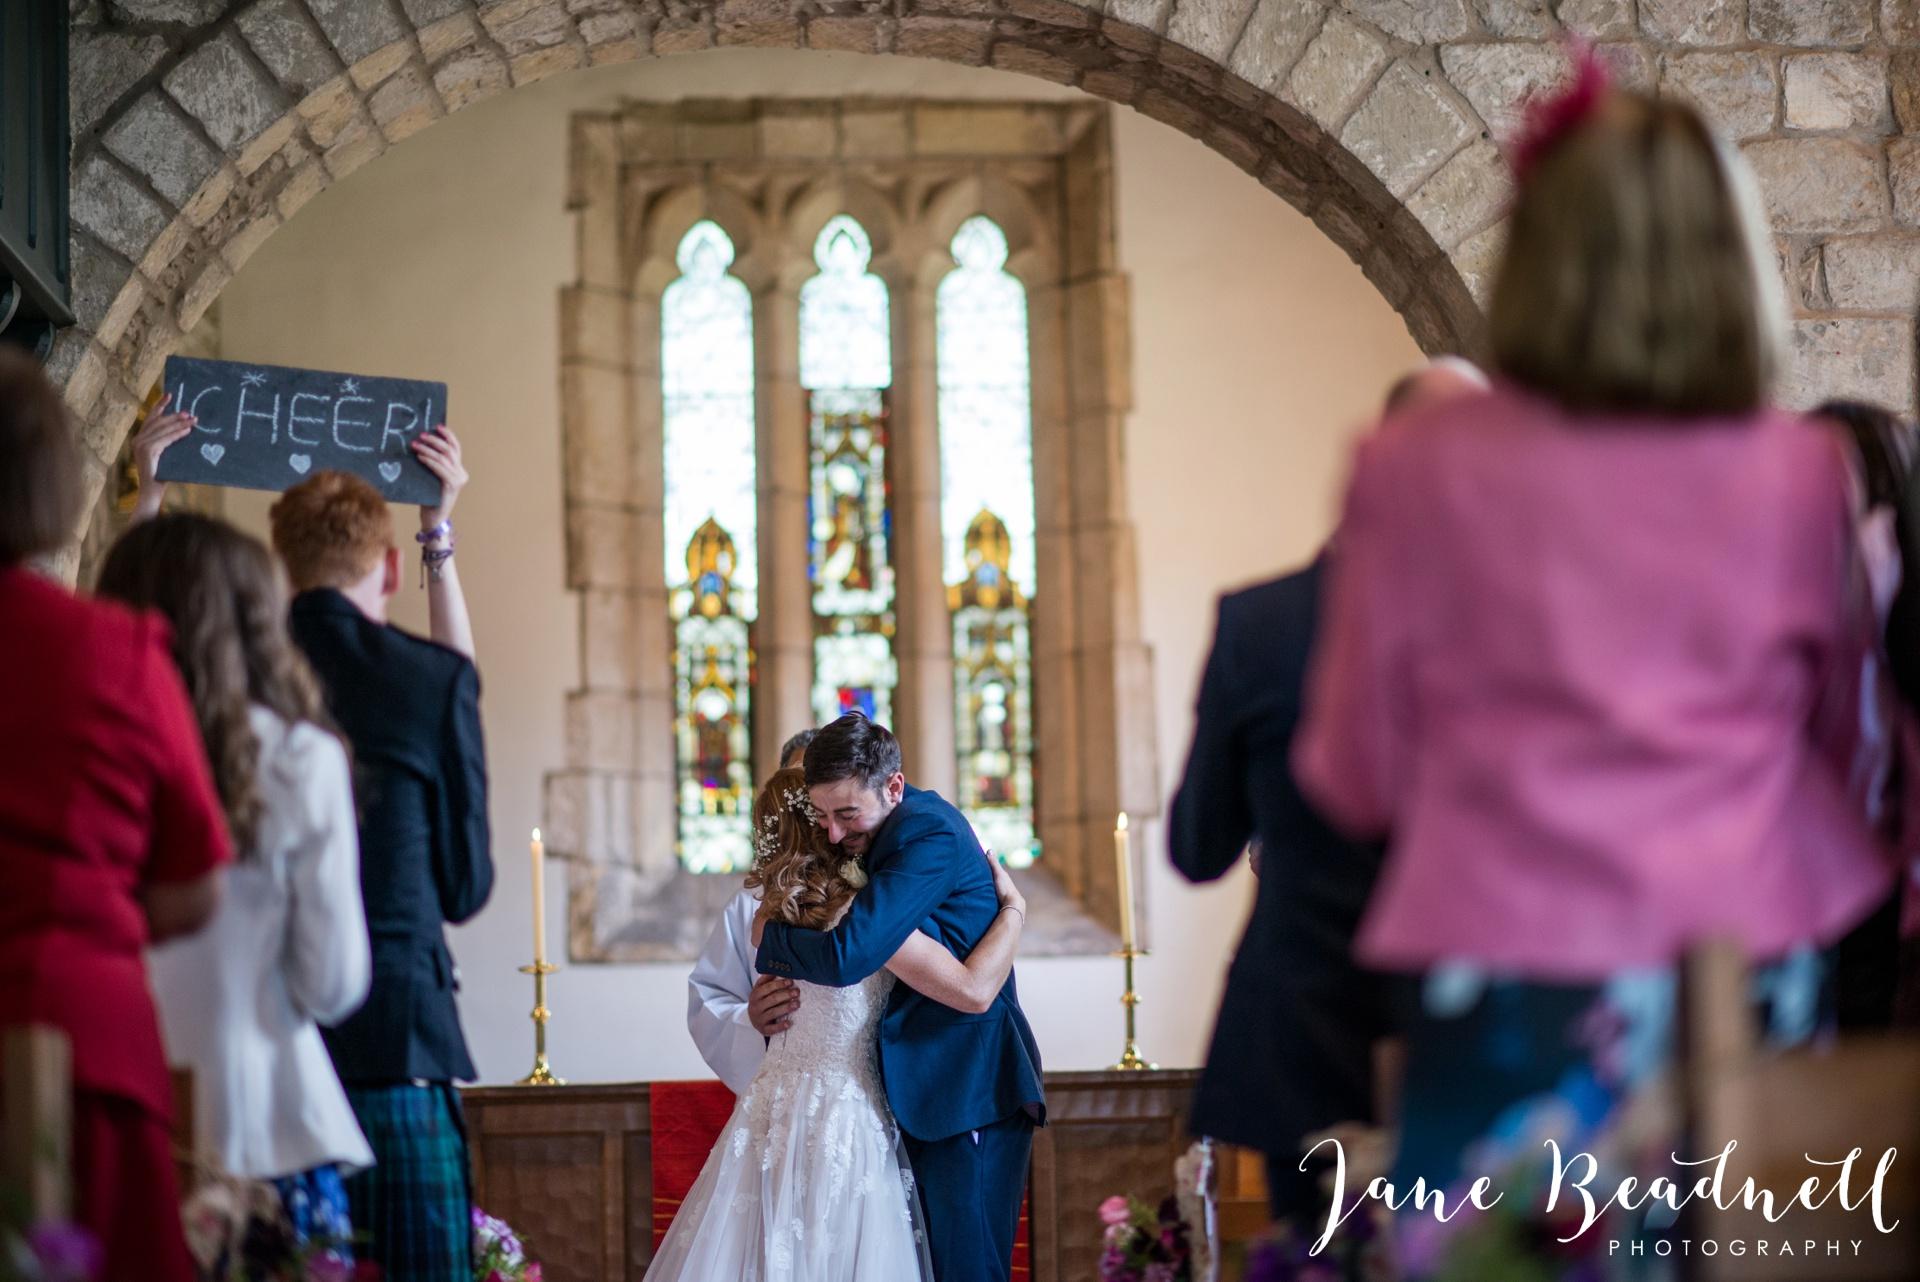 yorkshire-fine-art-wedding-photographer-jane-beadnell-photography-poppleton-york_0052